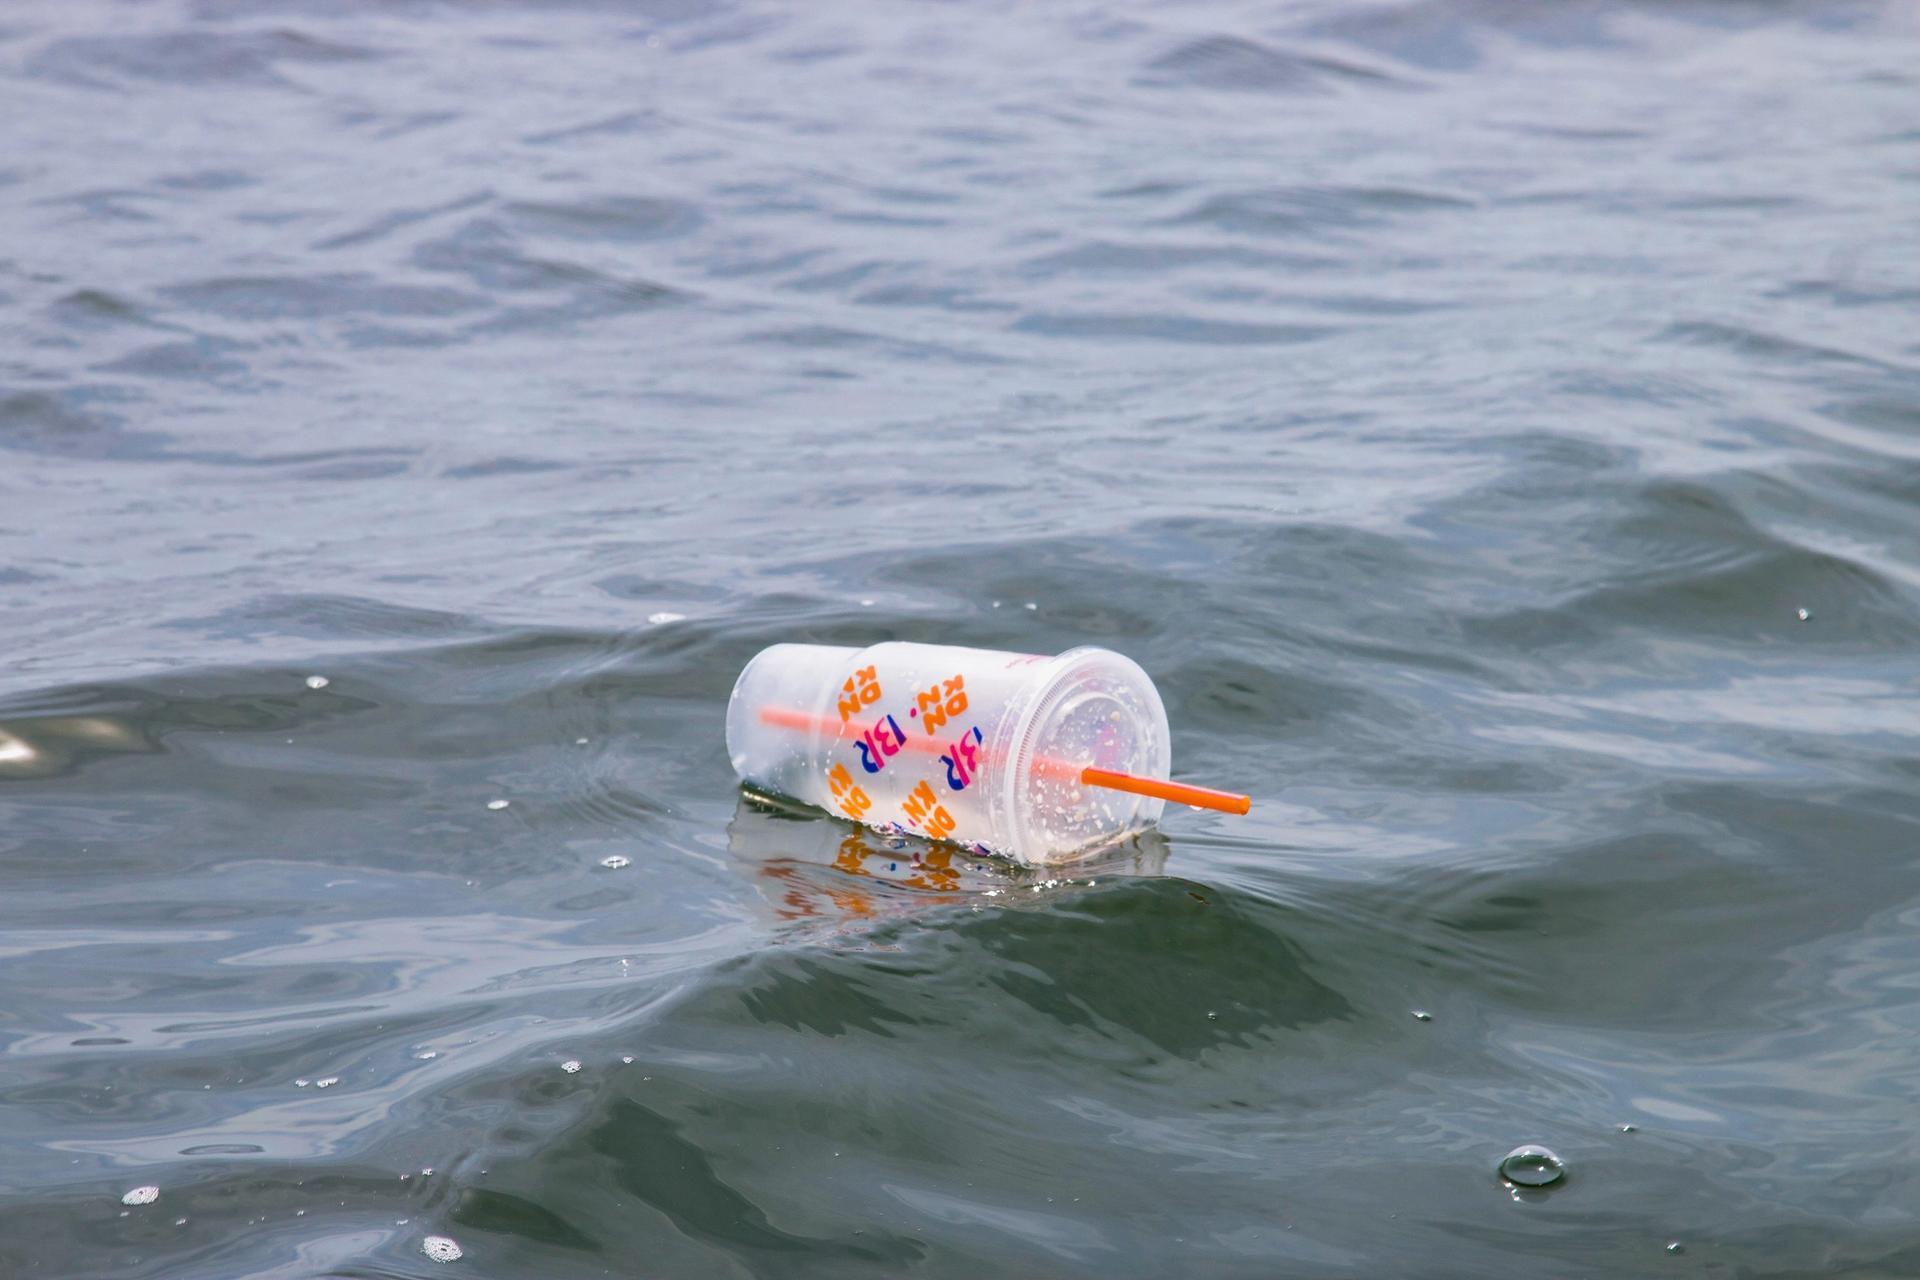 Prohibición plásticos